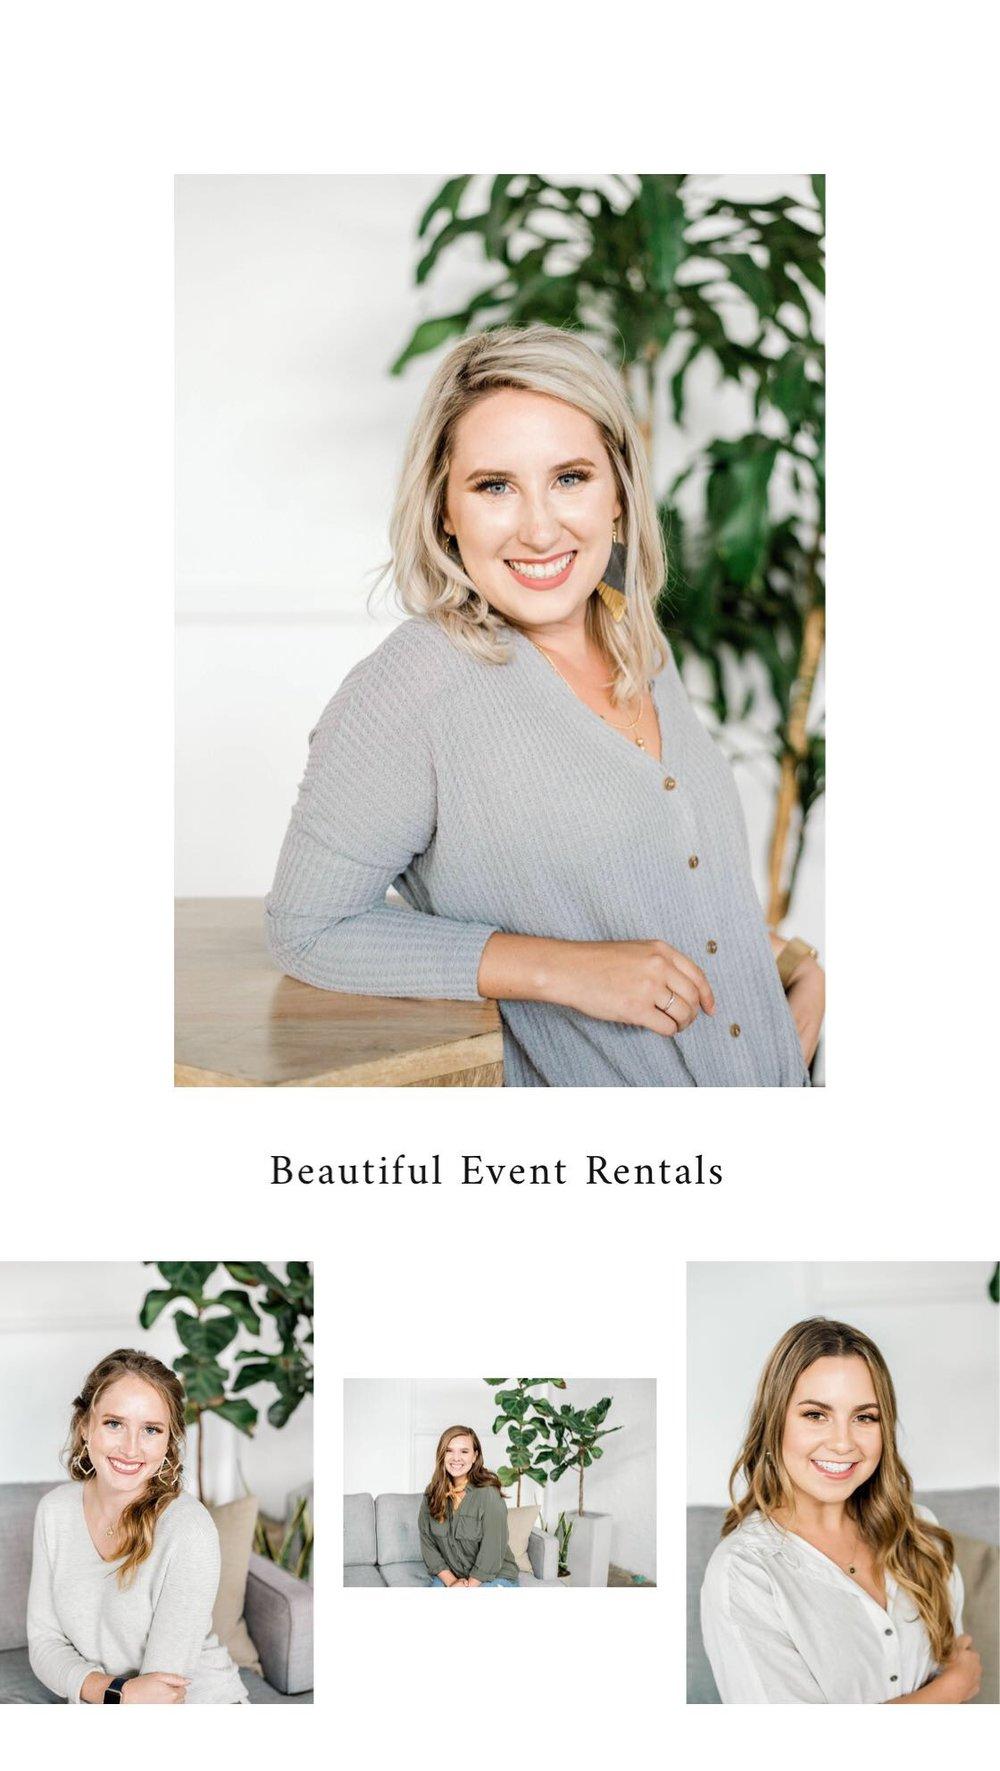 Beautiful Event Rentals